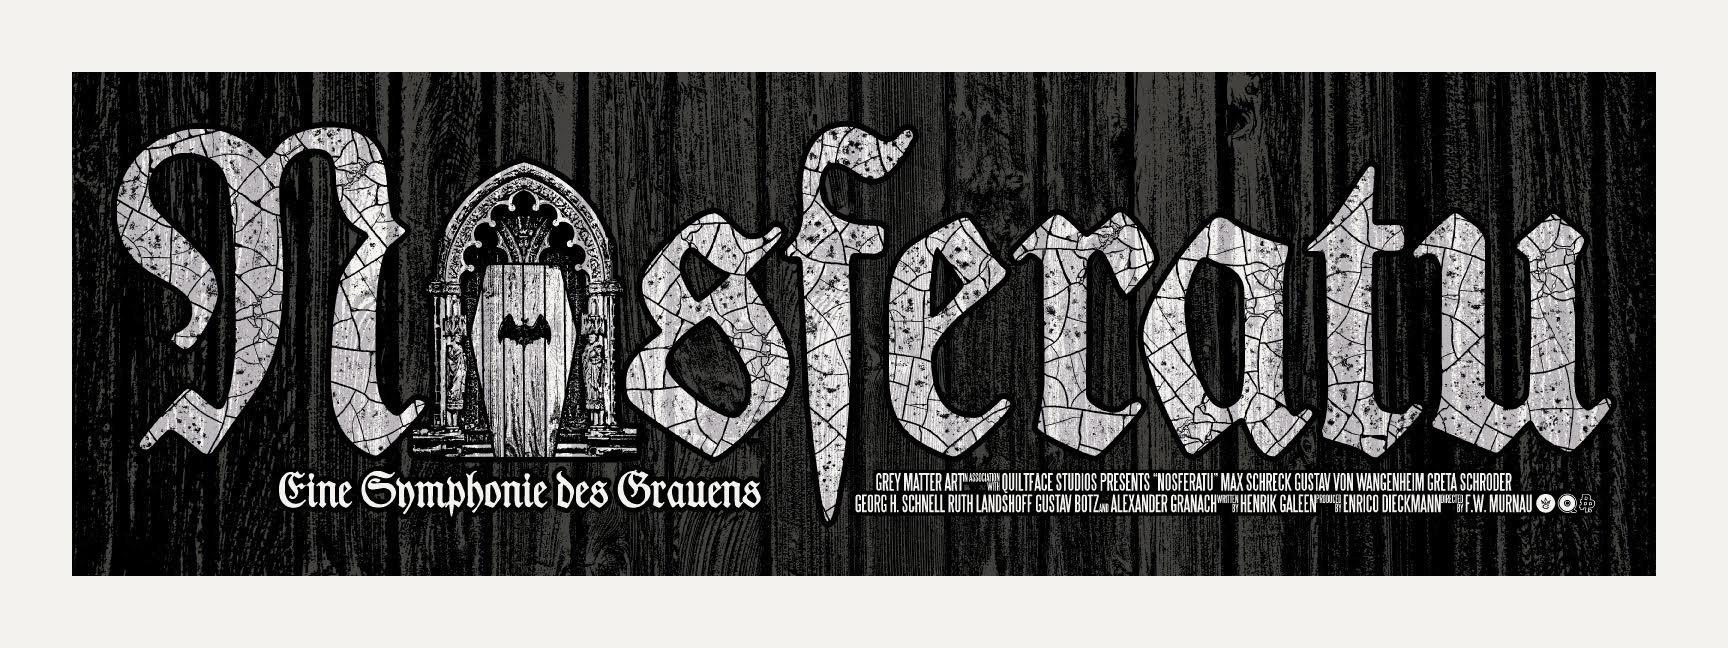 """Nosferatu"" by Chris Garofalo.  24"" x 9"" 3-color Screenprint w/ GID with on Mr. French Madero Beach SpeckleTone.  Ed of 40 S/N.  $25 (Crypt)"